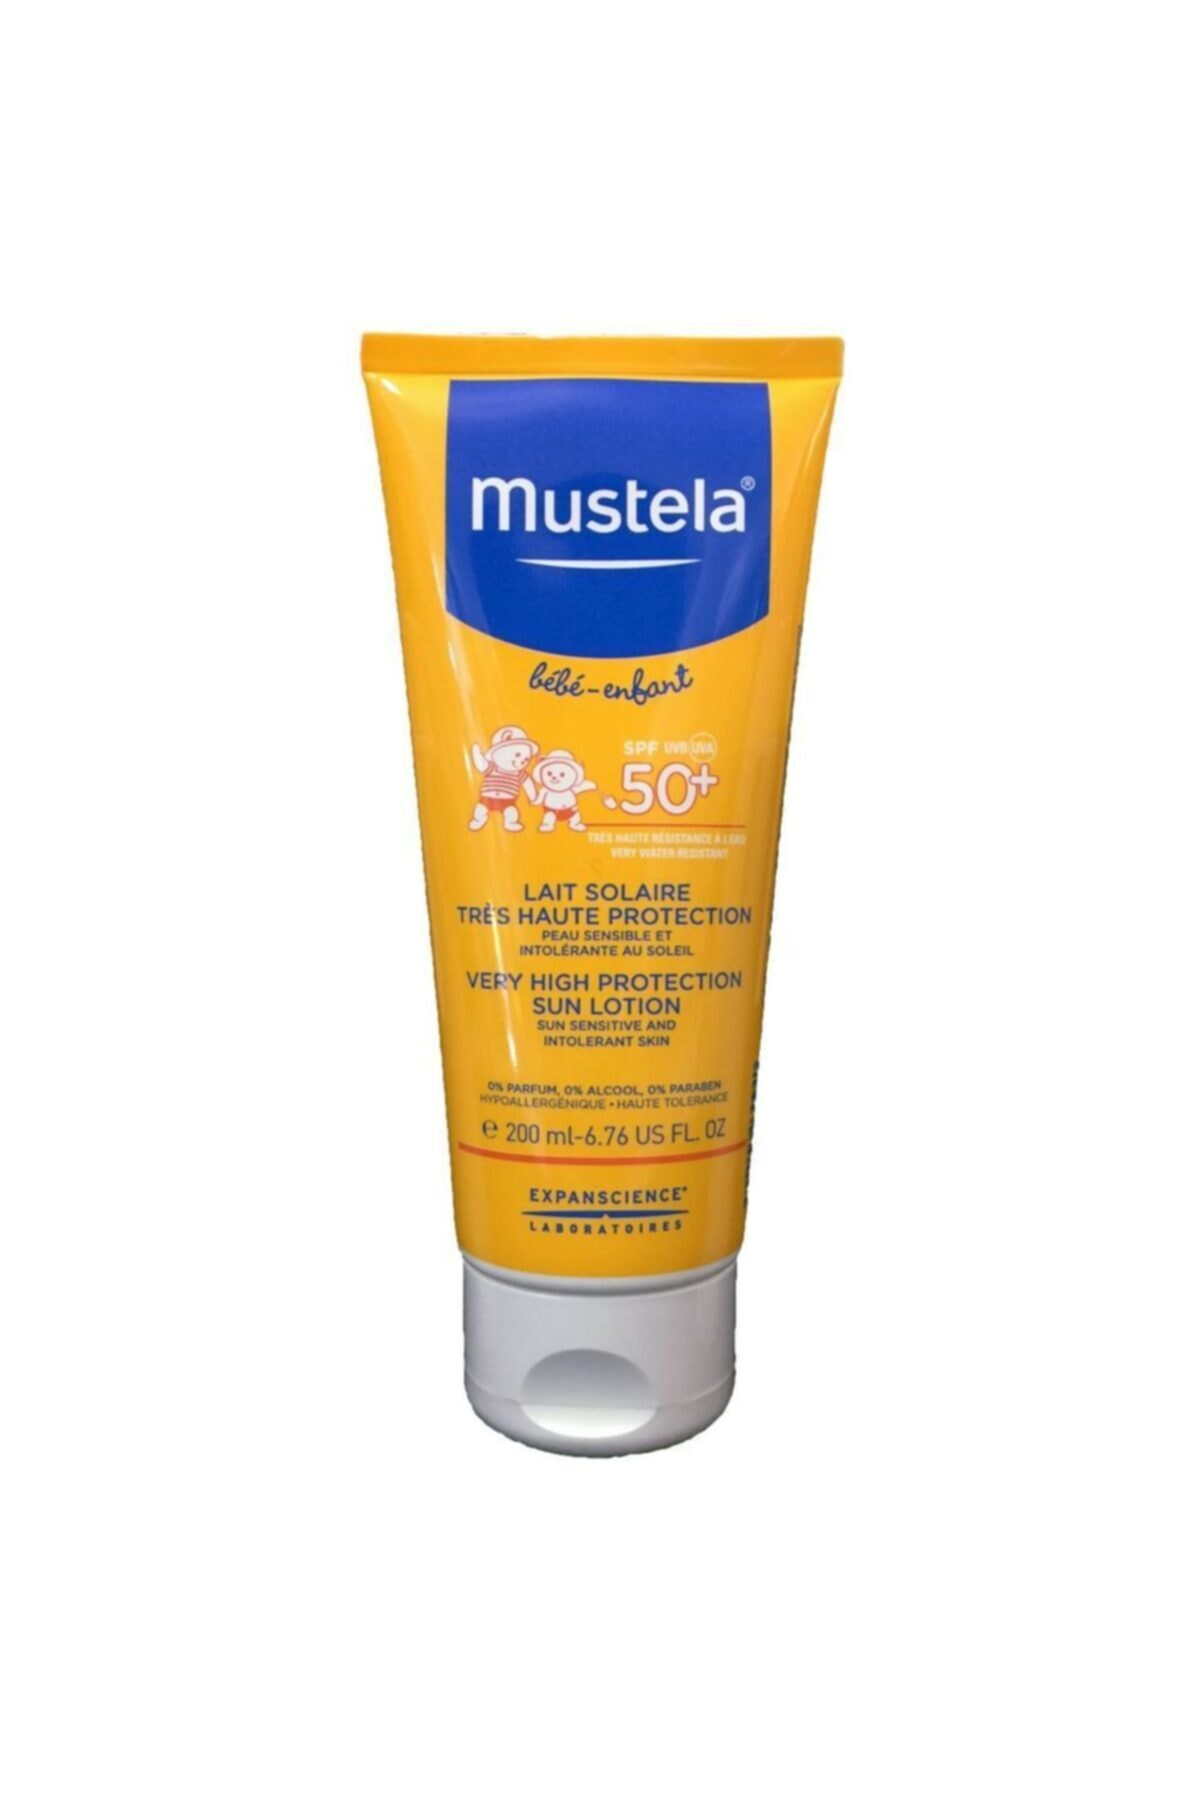 Mustela Very High Protection Sun Lotion Güneş Kremi Spf50+ 200 ml 1